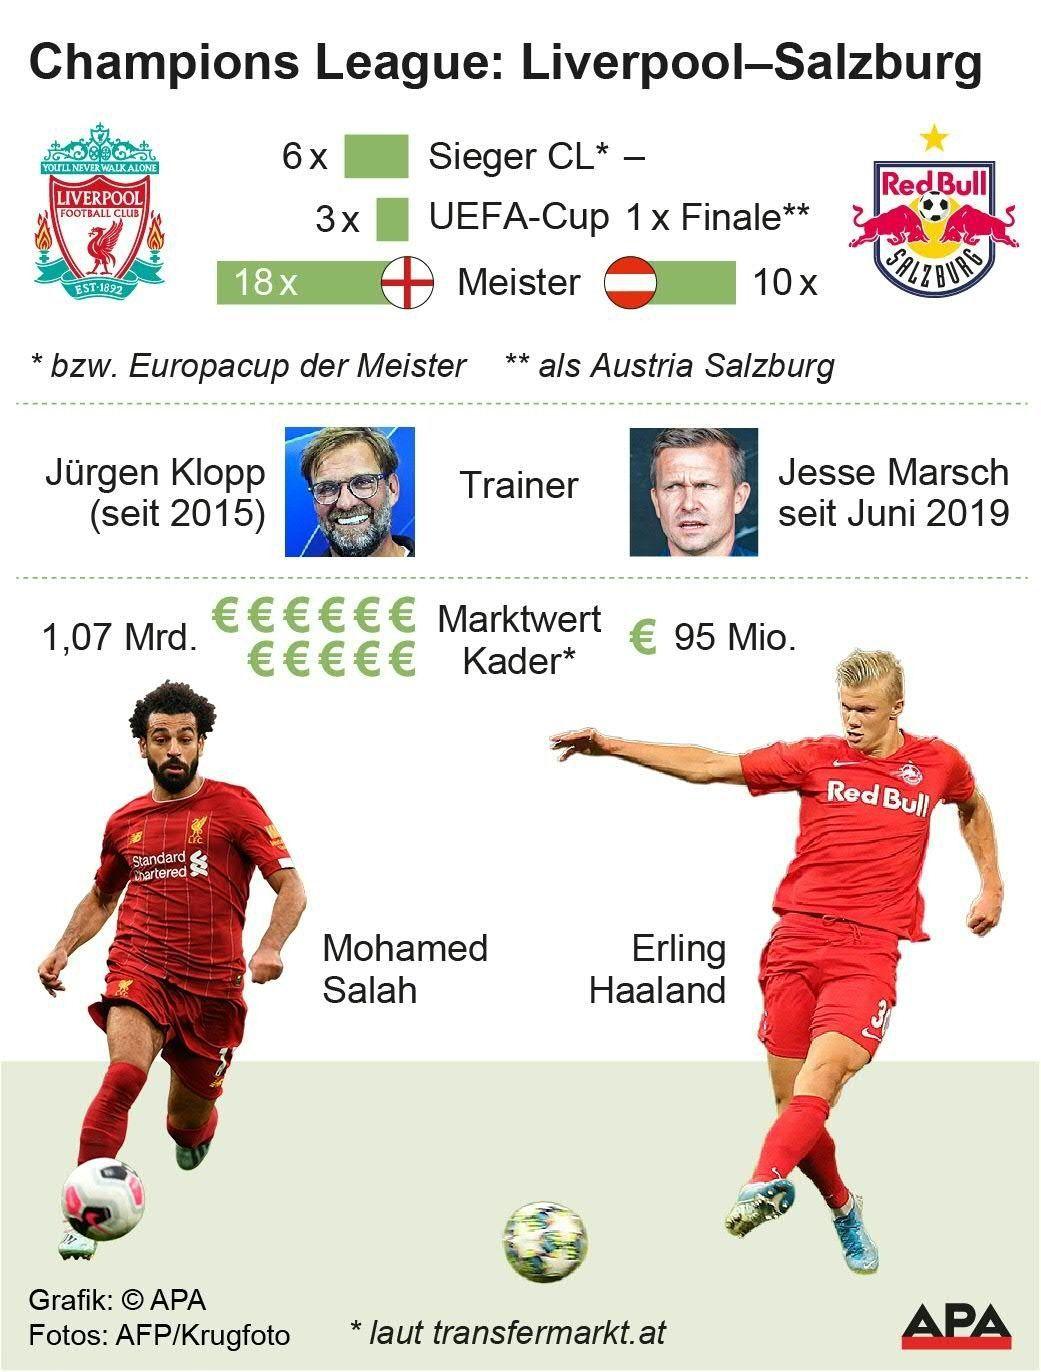 Champions League: Liverpool - Red Bull Salzburg